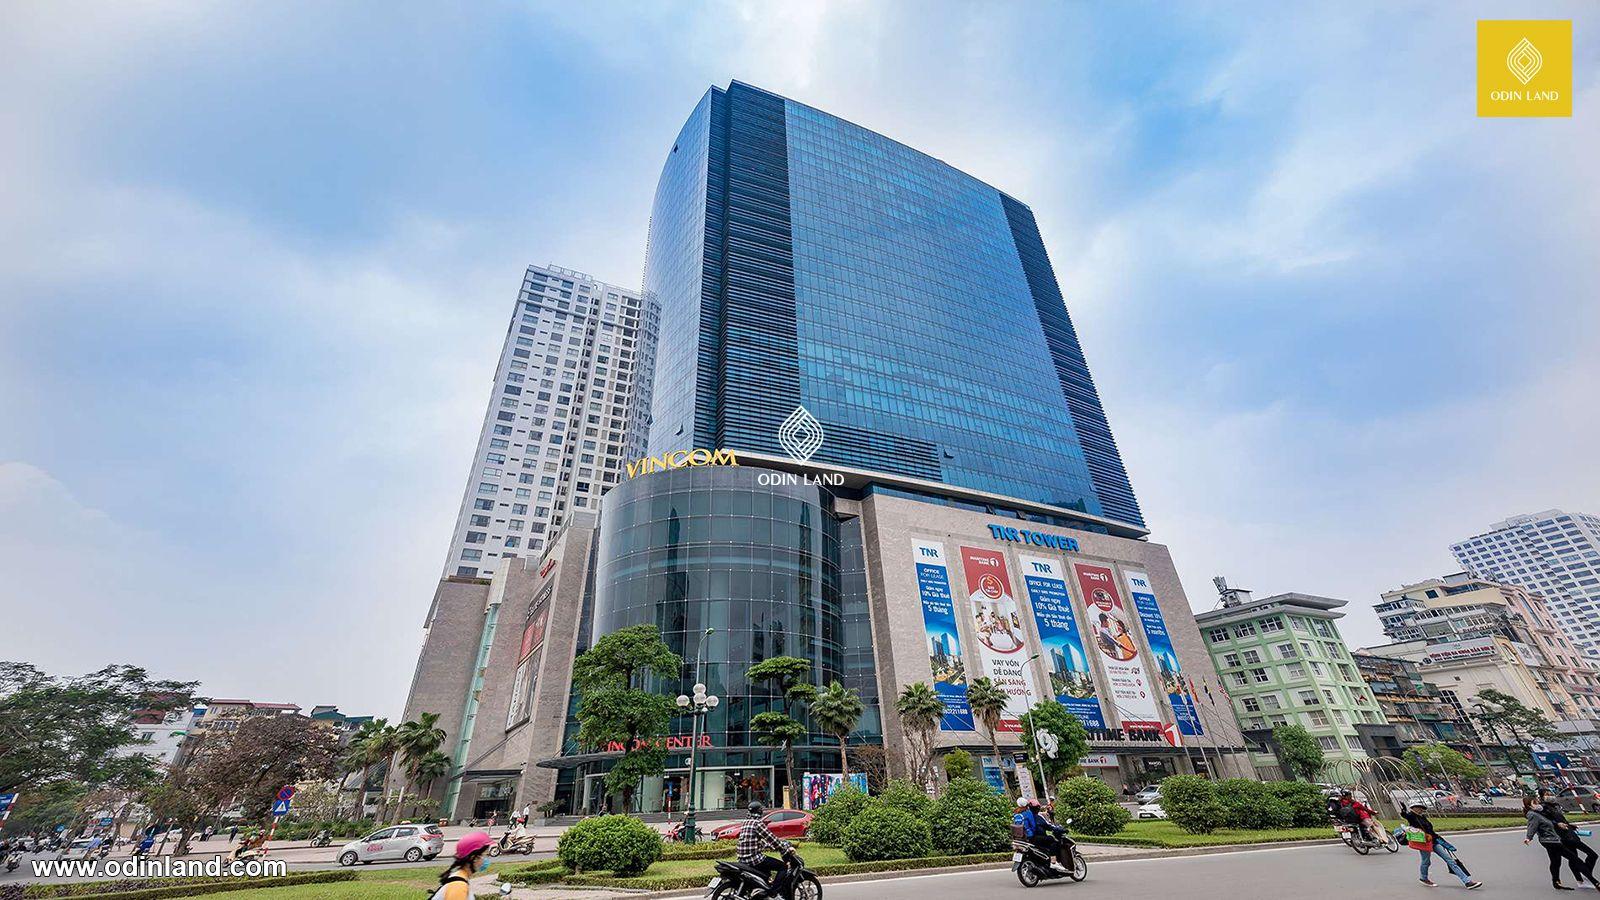 Van Phong Cho Thue Toa Nha Tnr Nguyen Chi Thanh Tower 1